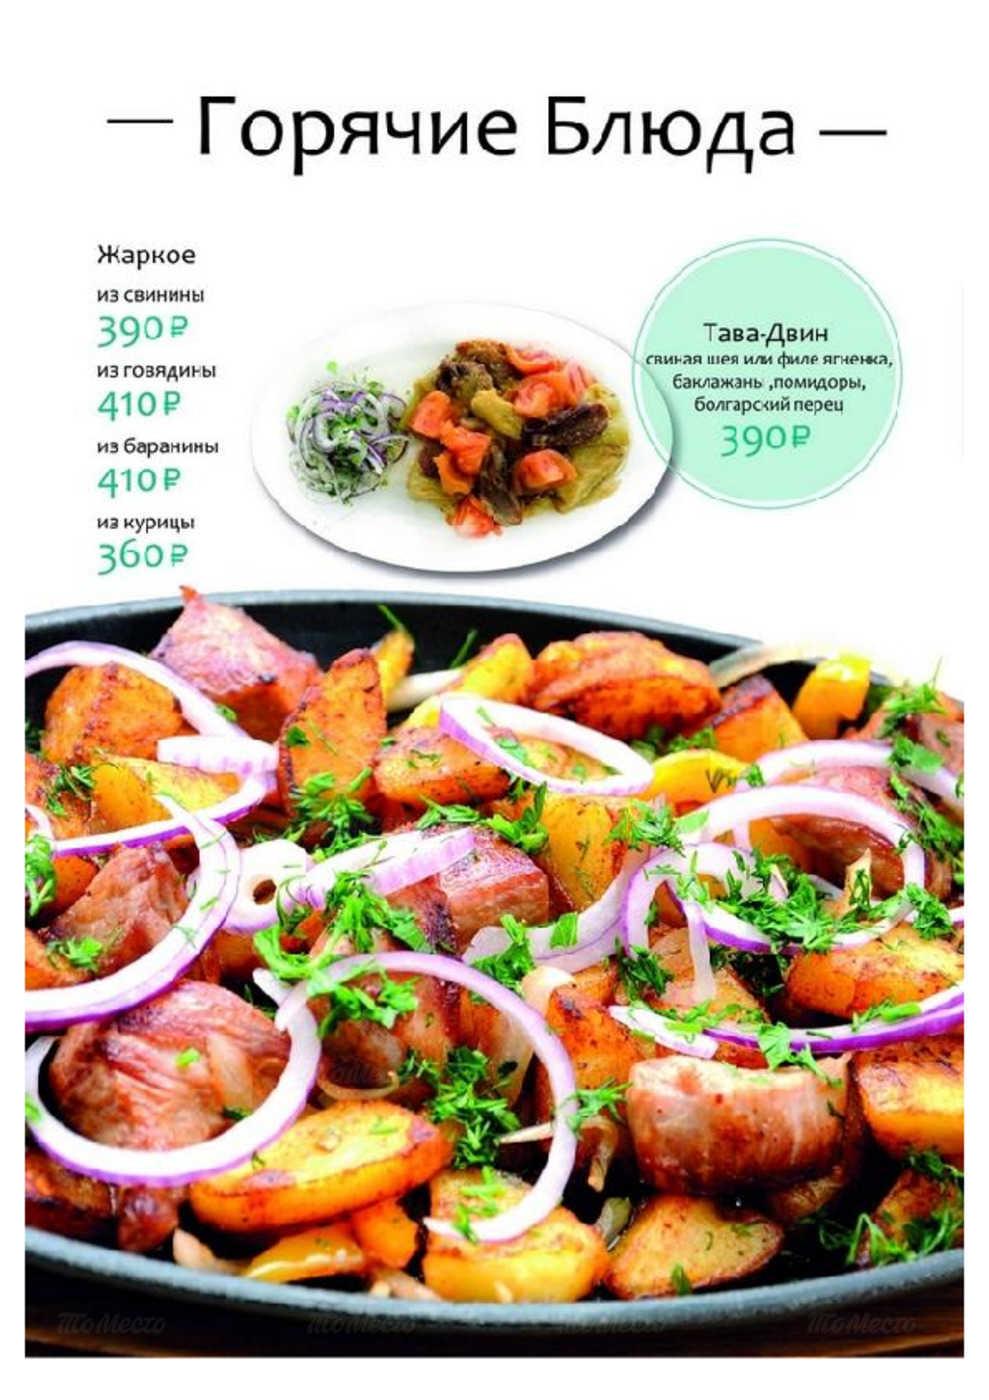 Меню ресторана Любимый Хабиб на проспекте Стачек фото 19